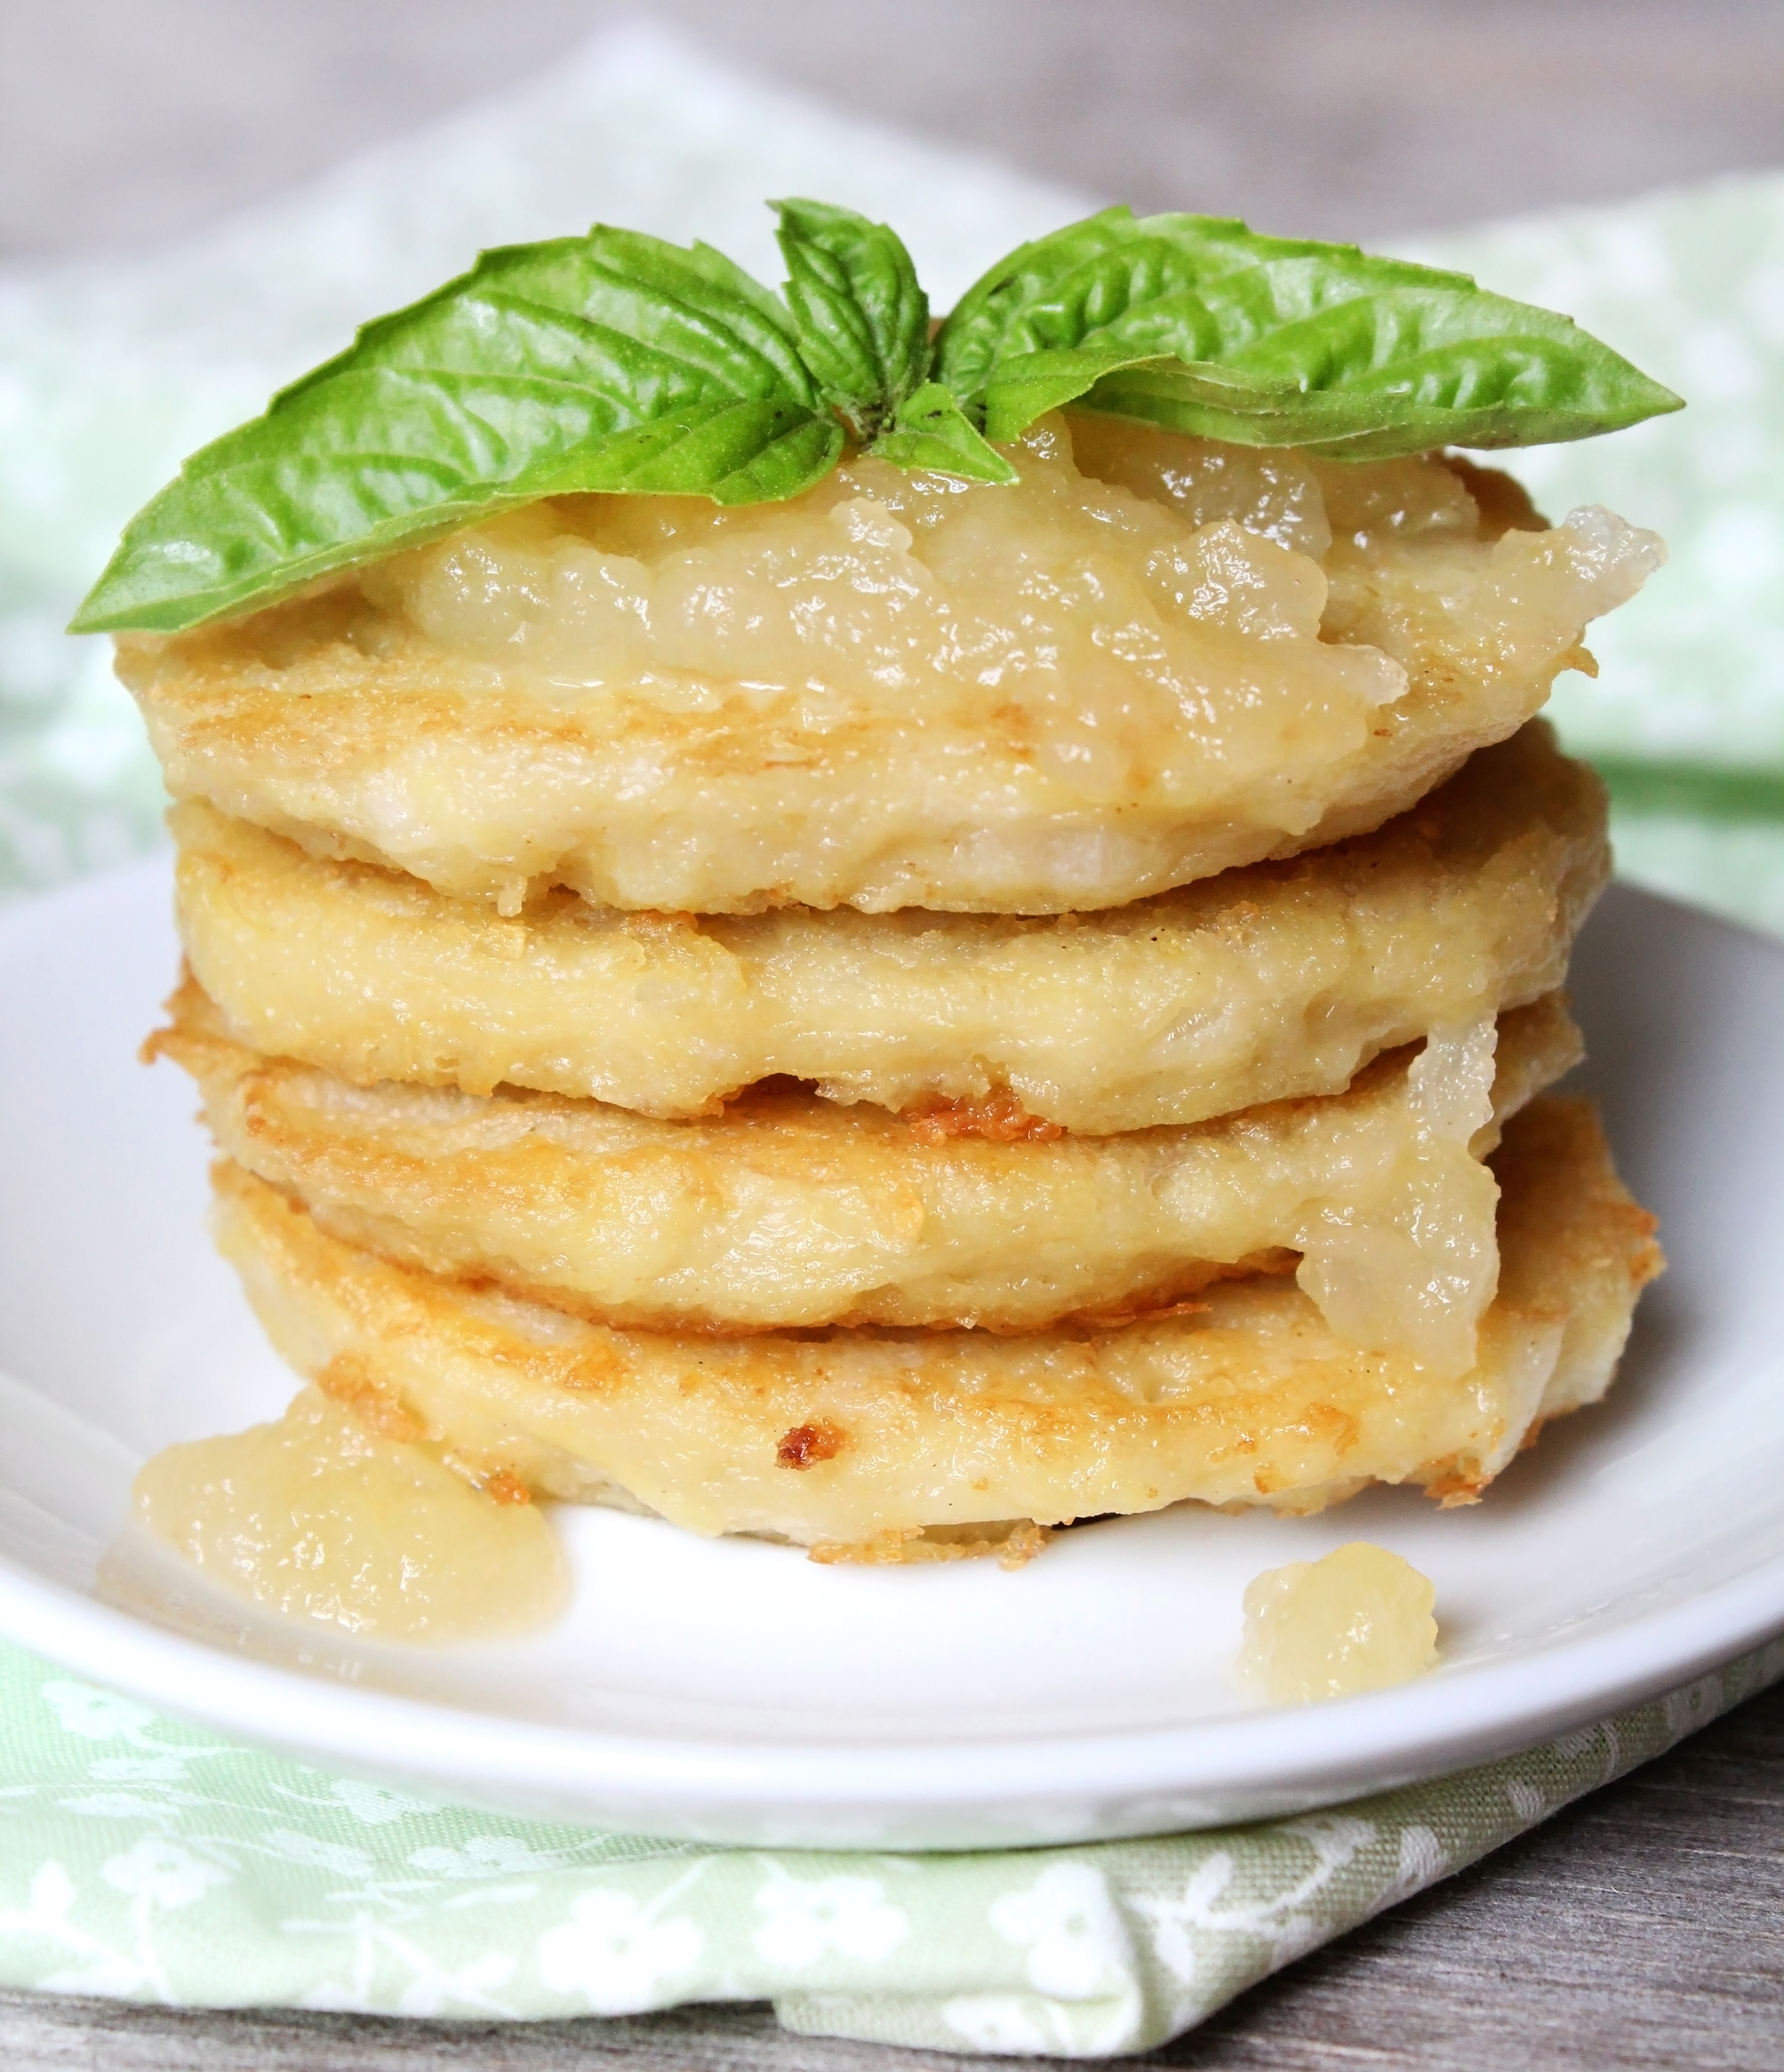 Recipes Course Breakfast Potatoes Mashed Potato Pancakes